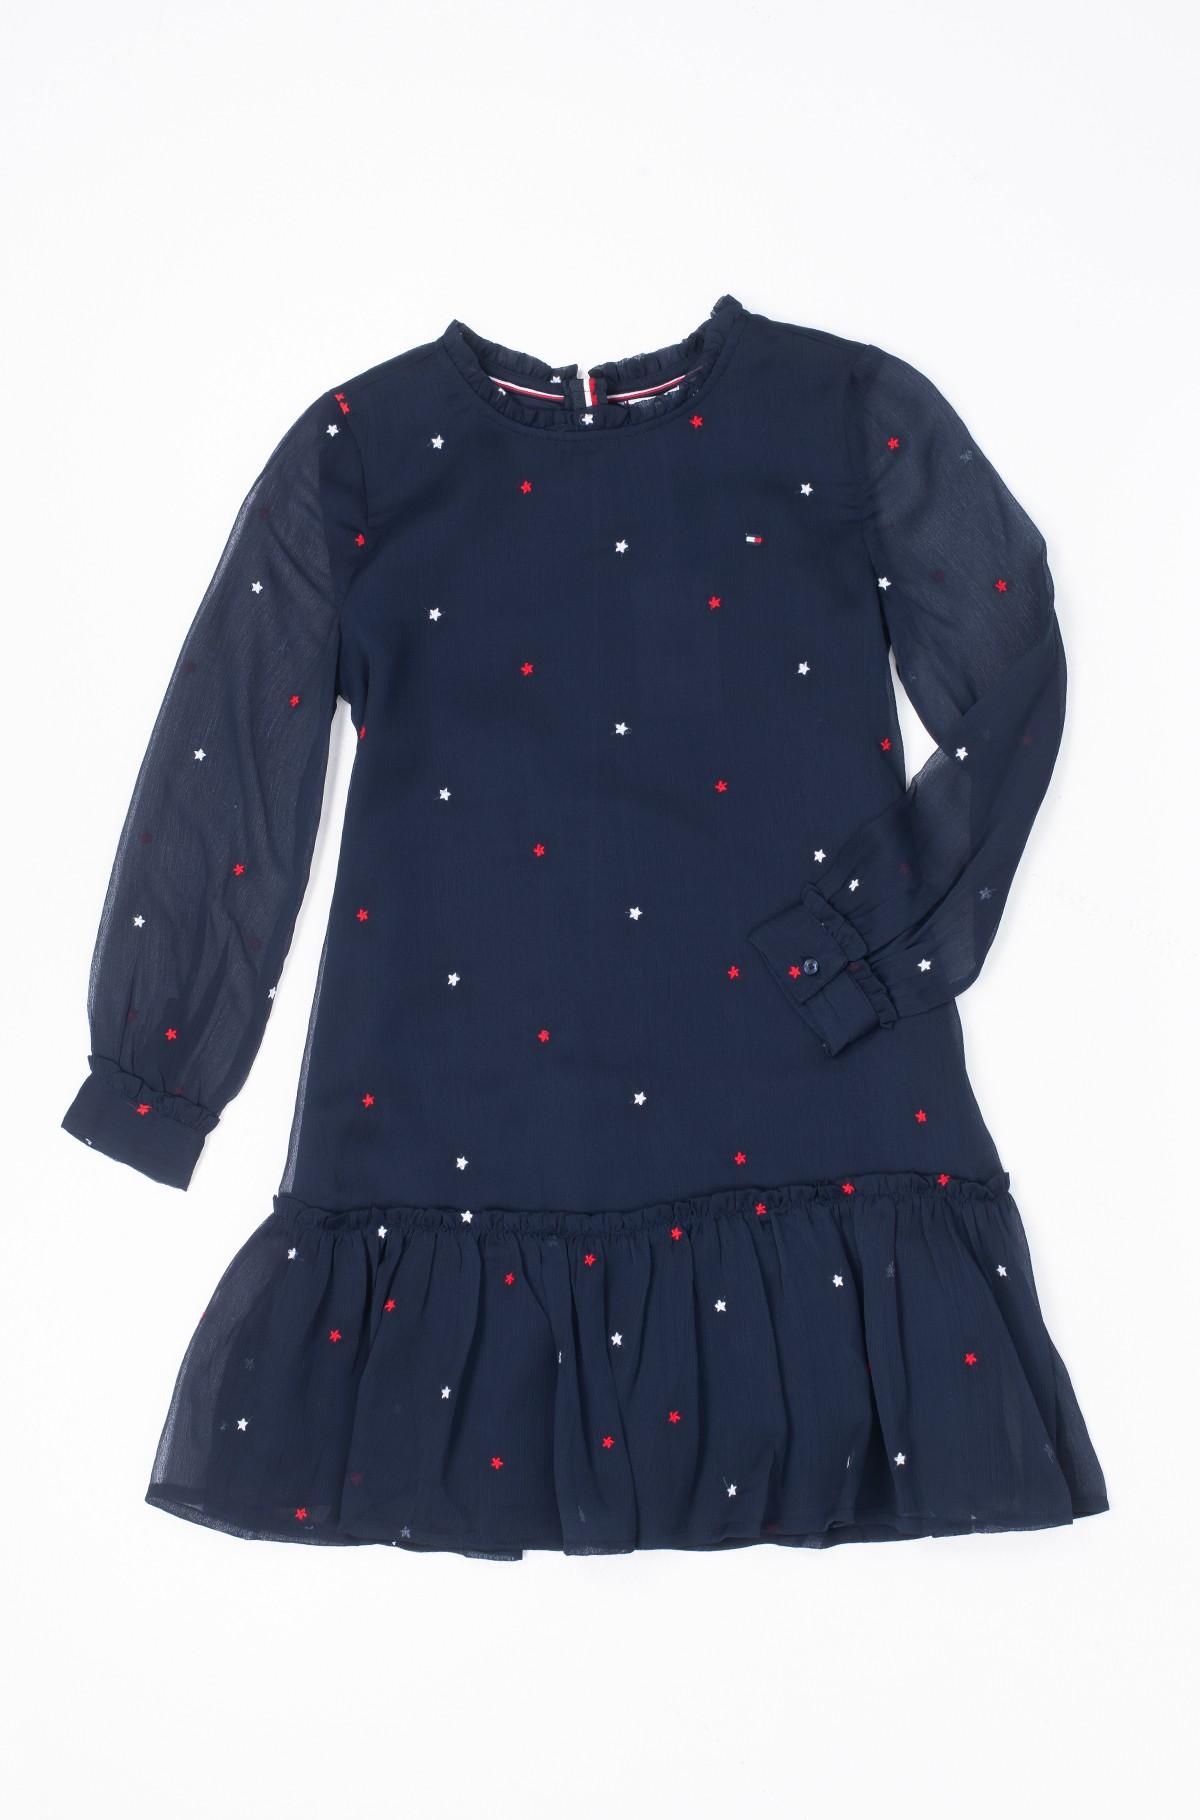 Vaikiška suknelė STAR EMBROIDERED DRESS-full-1